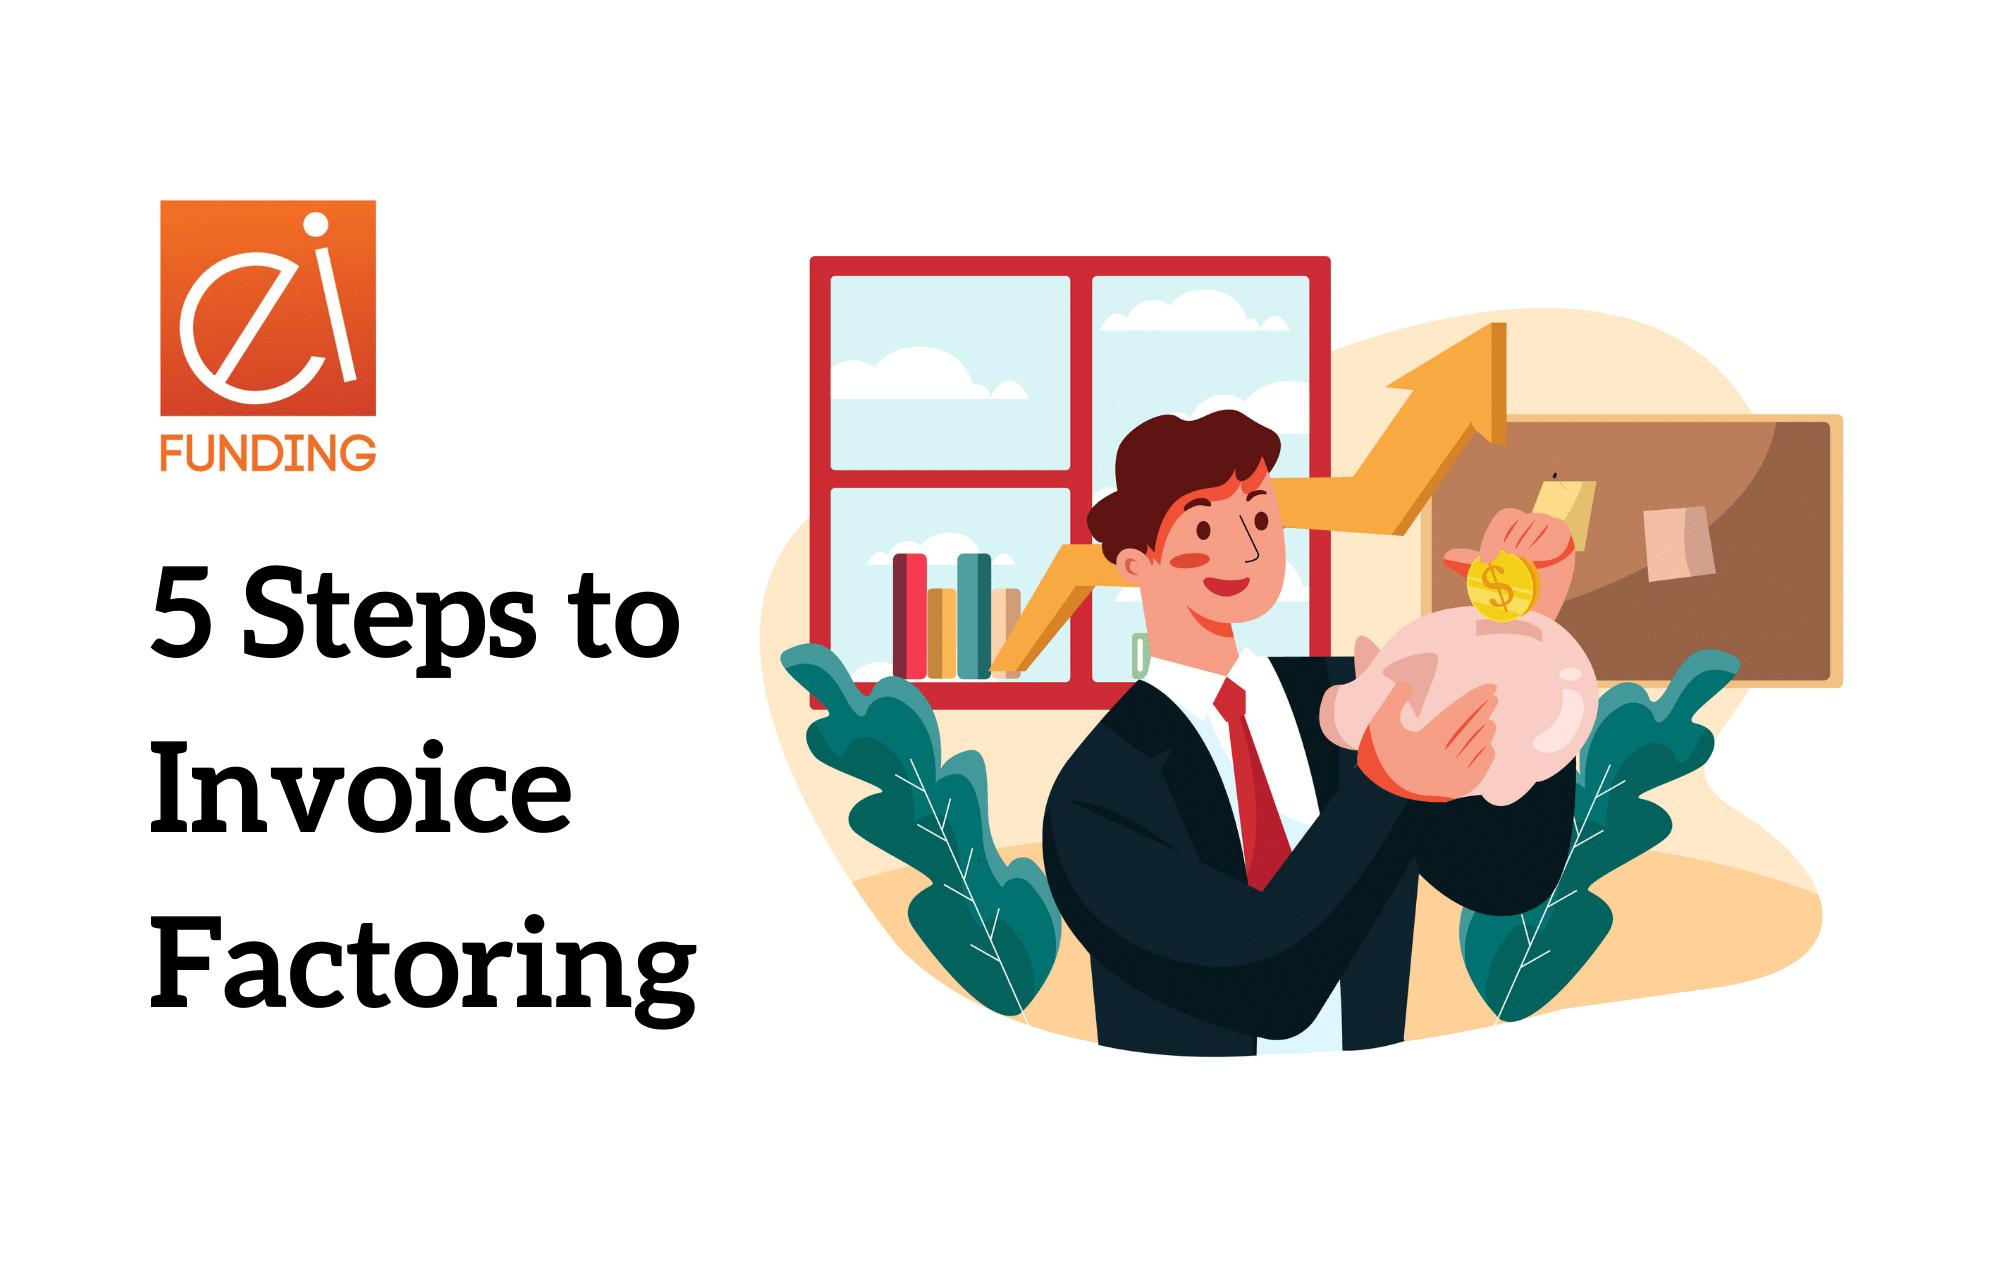 ei Funding blog - 5 Steps to Invoice Factoring